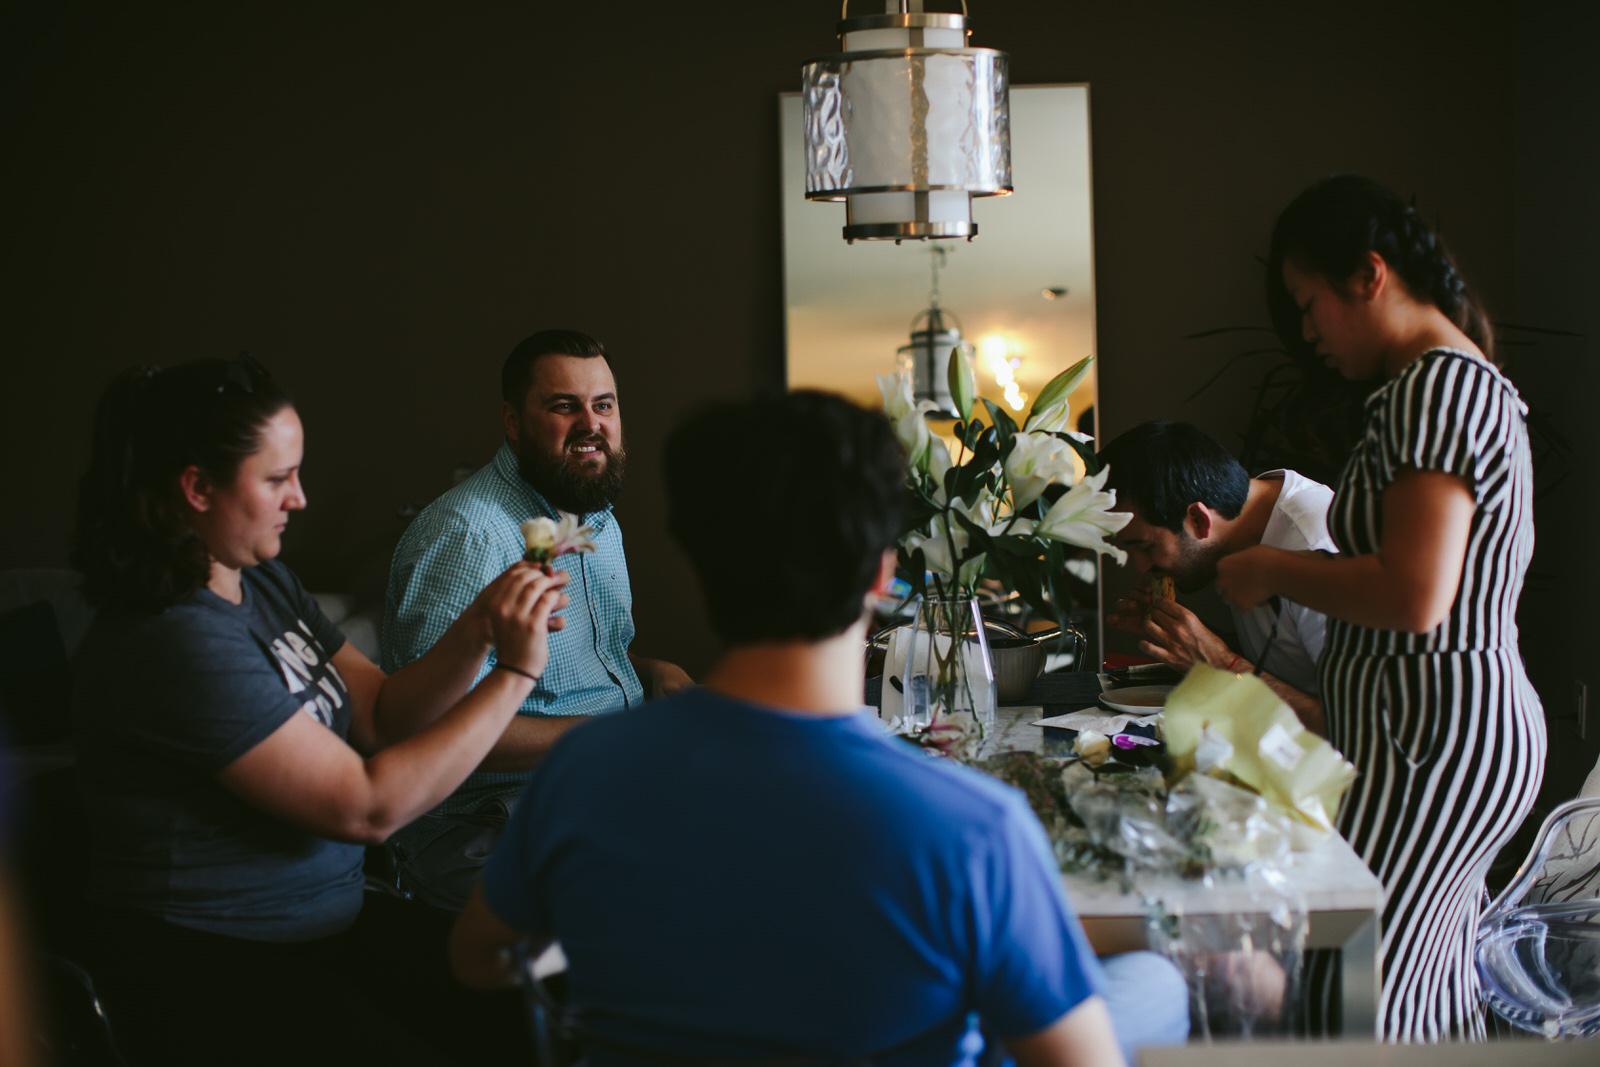 intimate_wedding_elopement_destination_miami_grooms_getting_ready-24.jpg